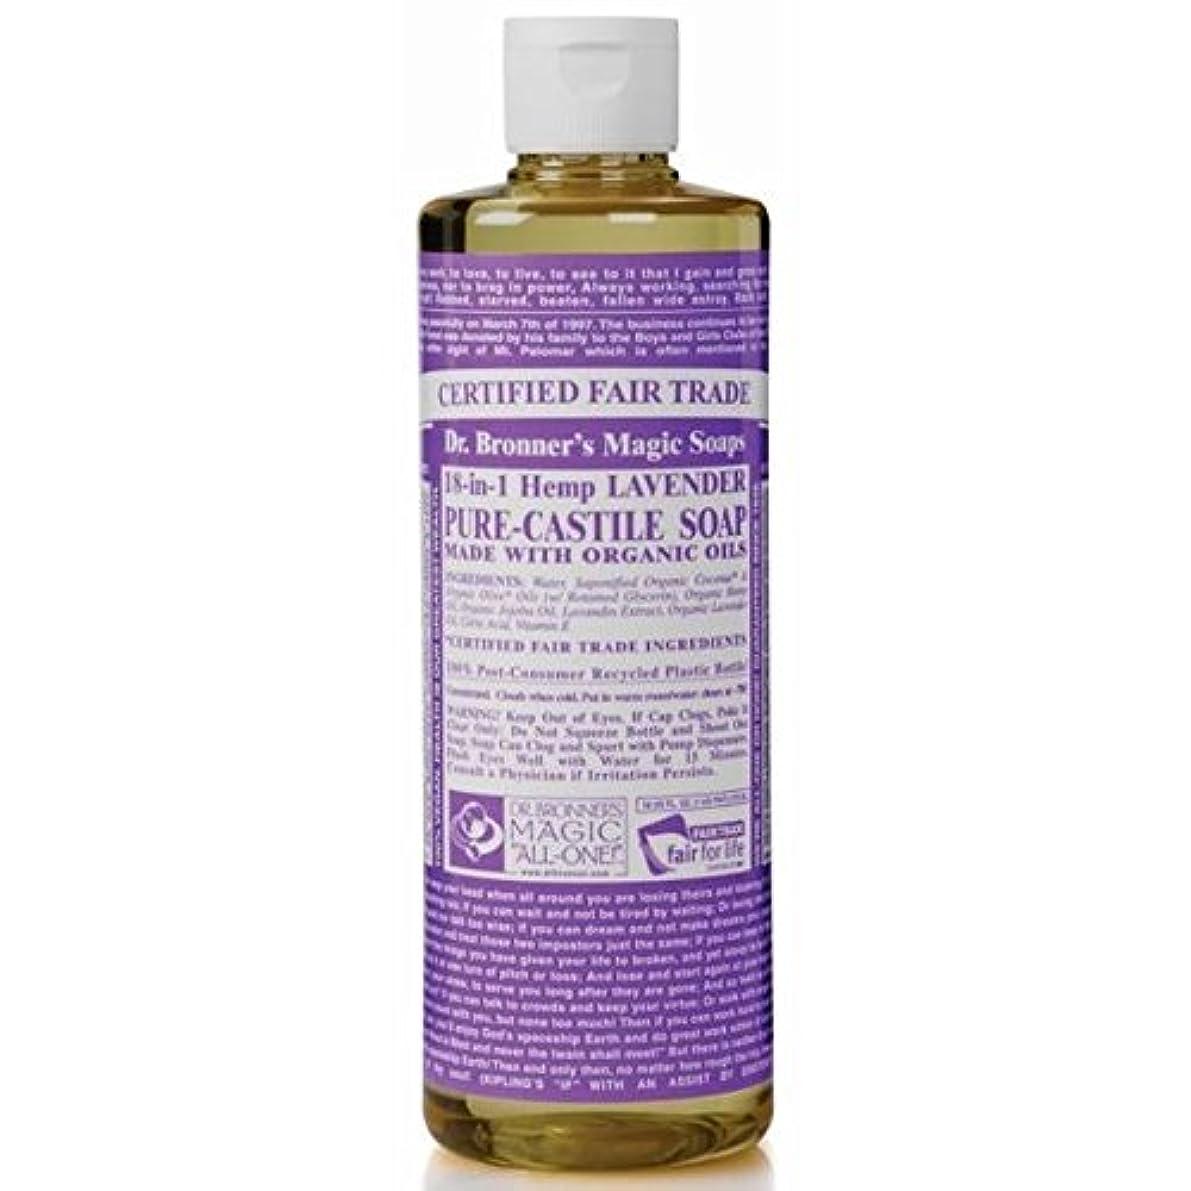 Dr Bronner Organic Lavender Castile Liquid Soap 237ml (Pack of 6) - のブロナー有機ラベンダーカスティーリャ液体石鹸237ミリリットル x6 [並行輸入品]